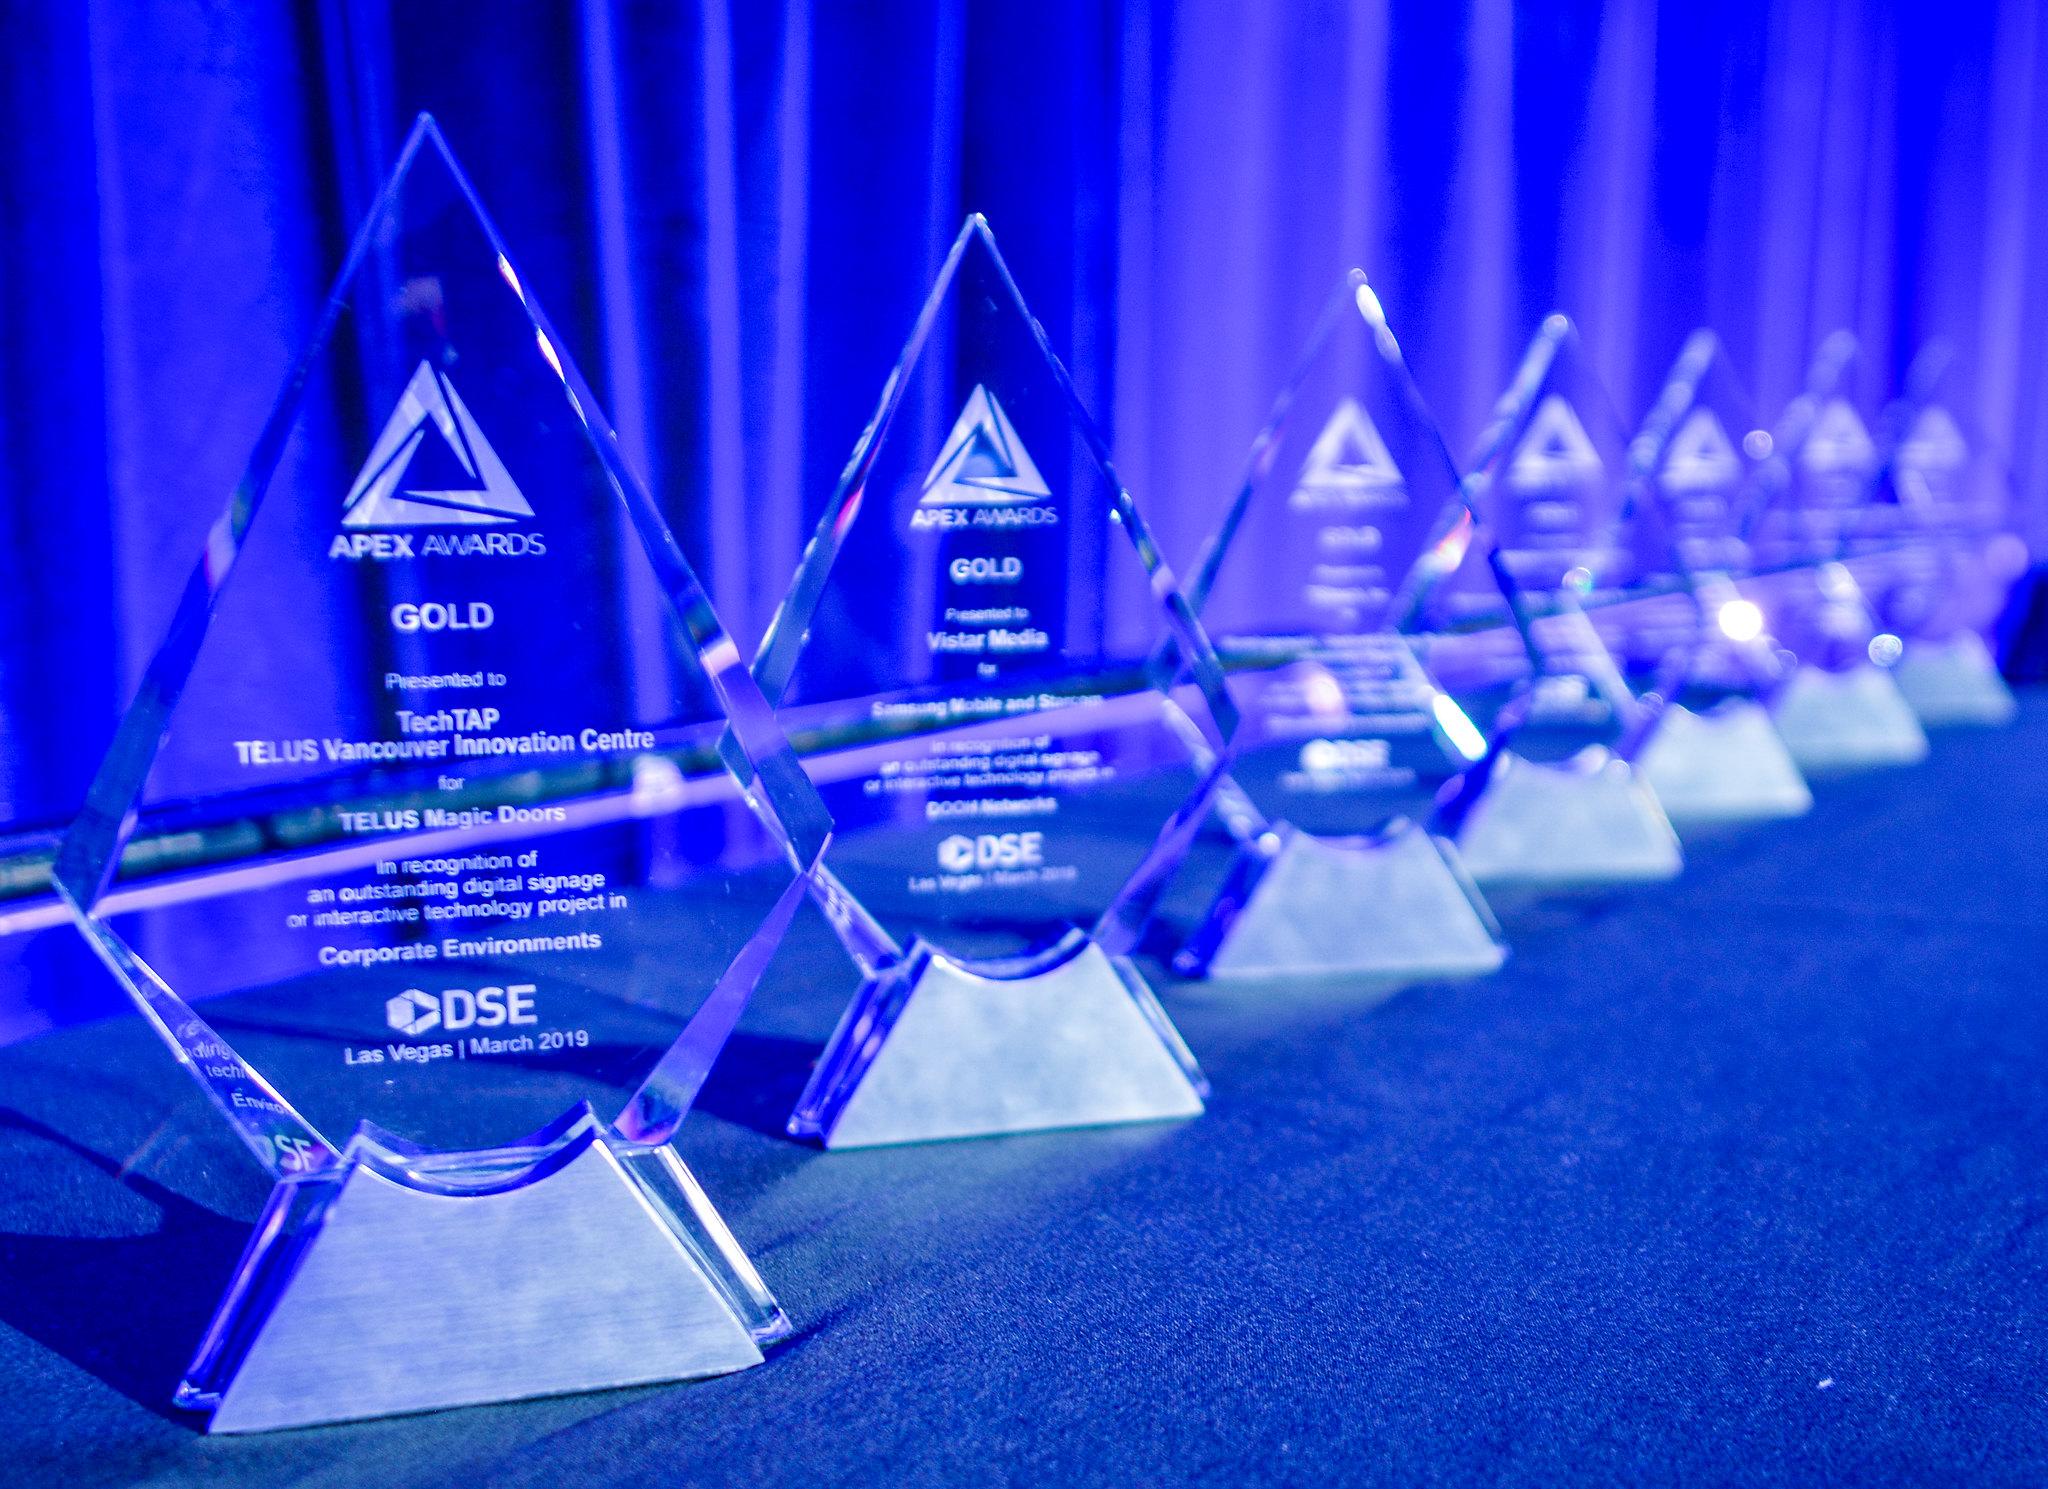 DFSE Apex Awards